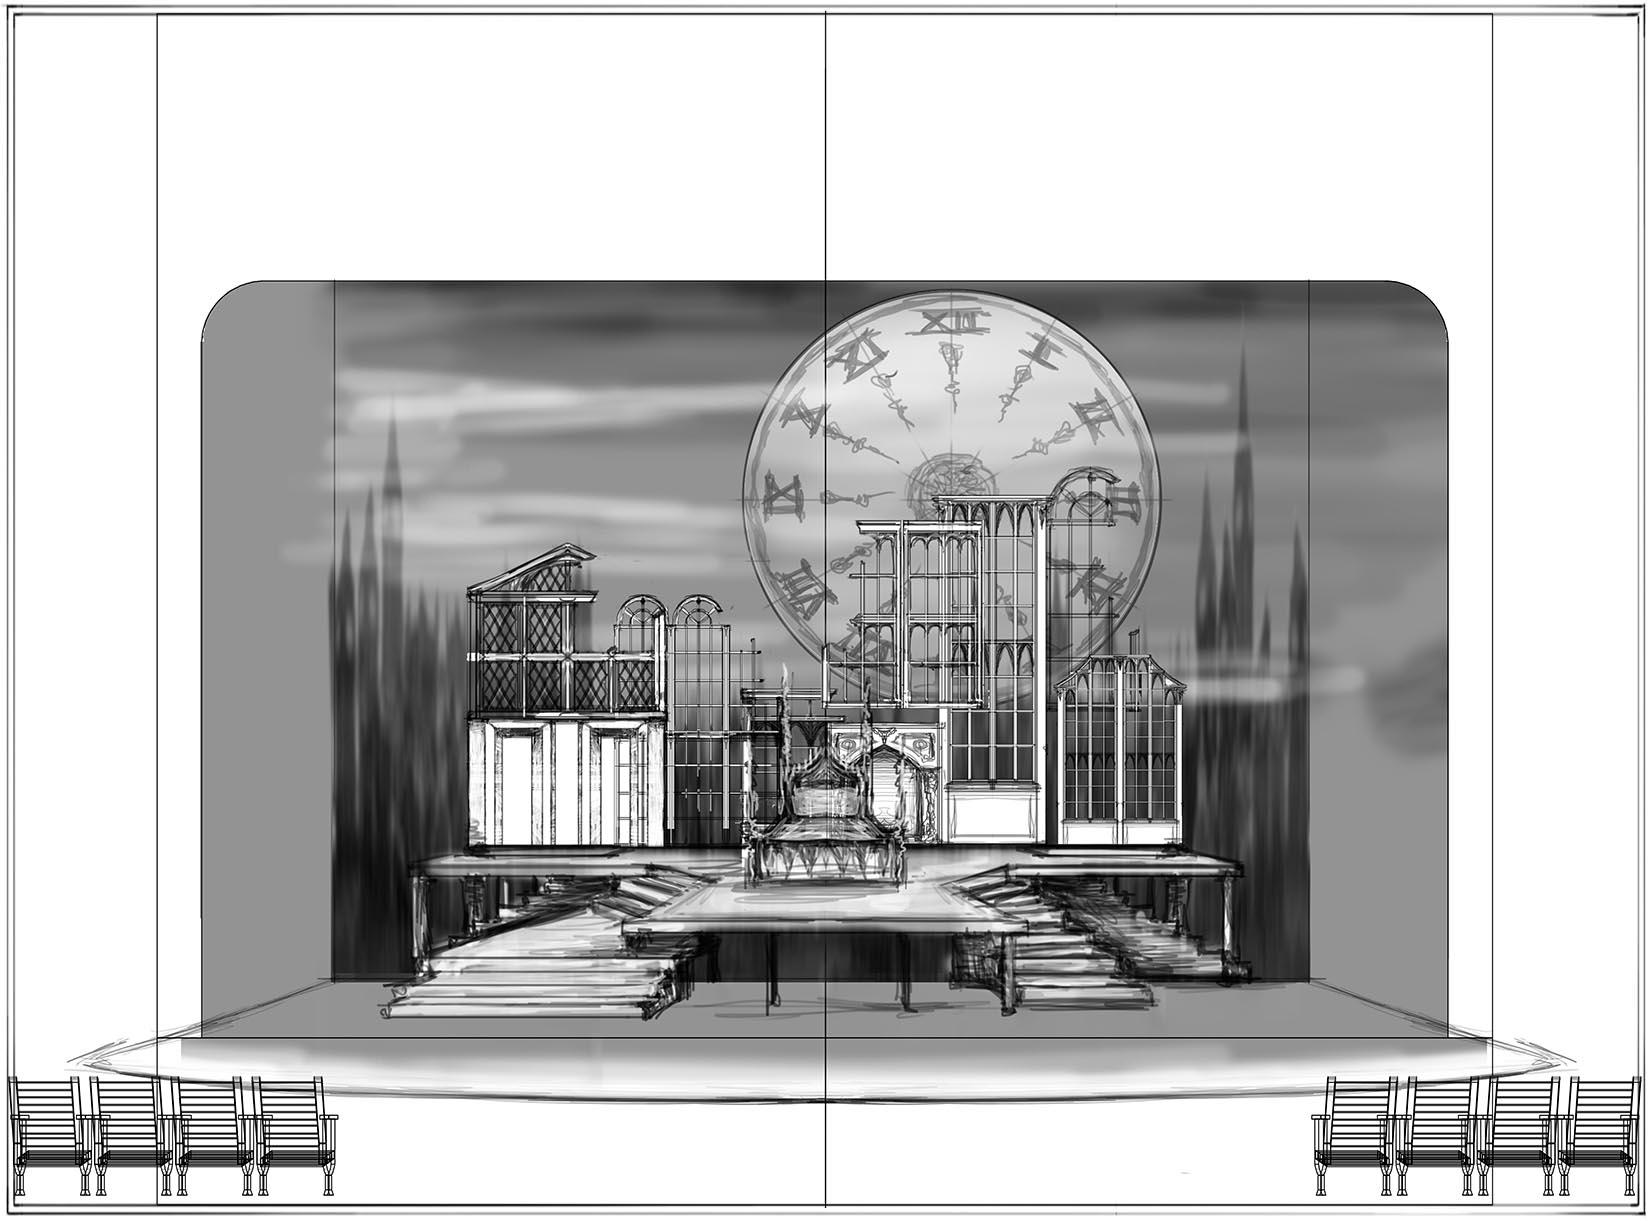 Sketch Final Version